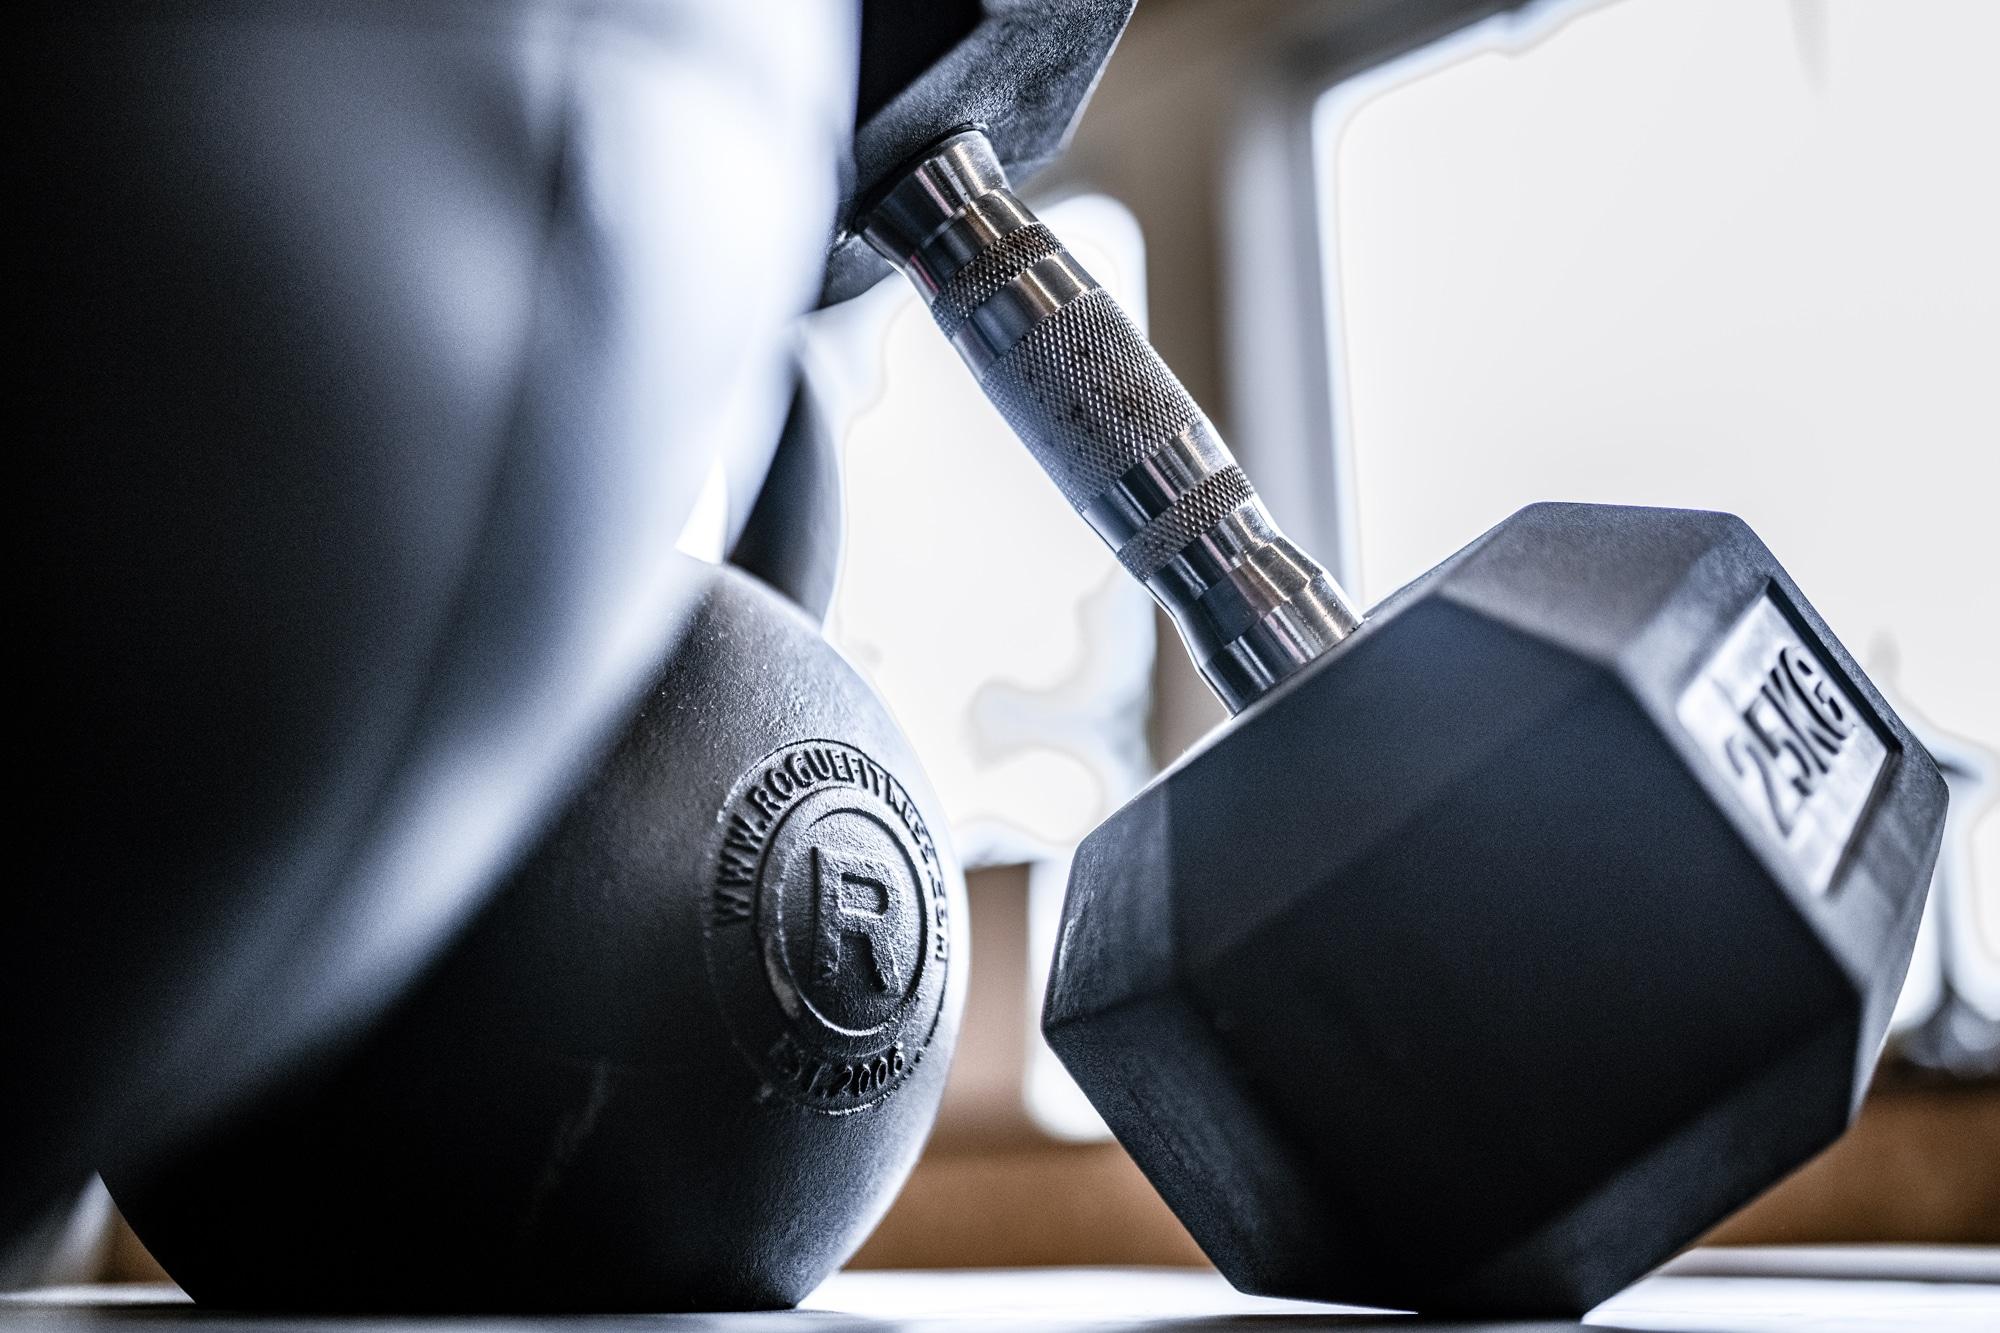 crossfit-basaltkraft-weights